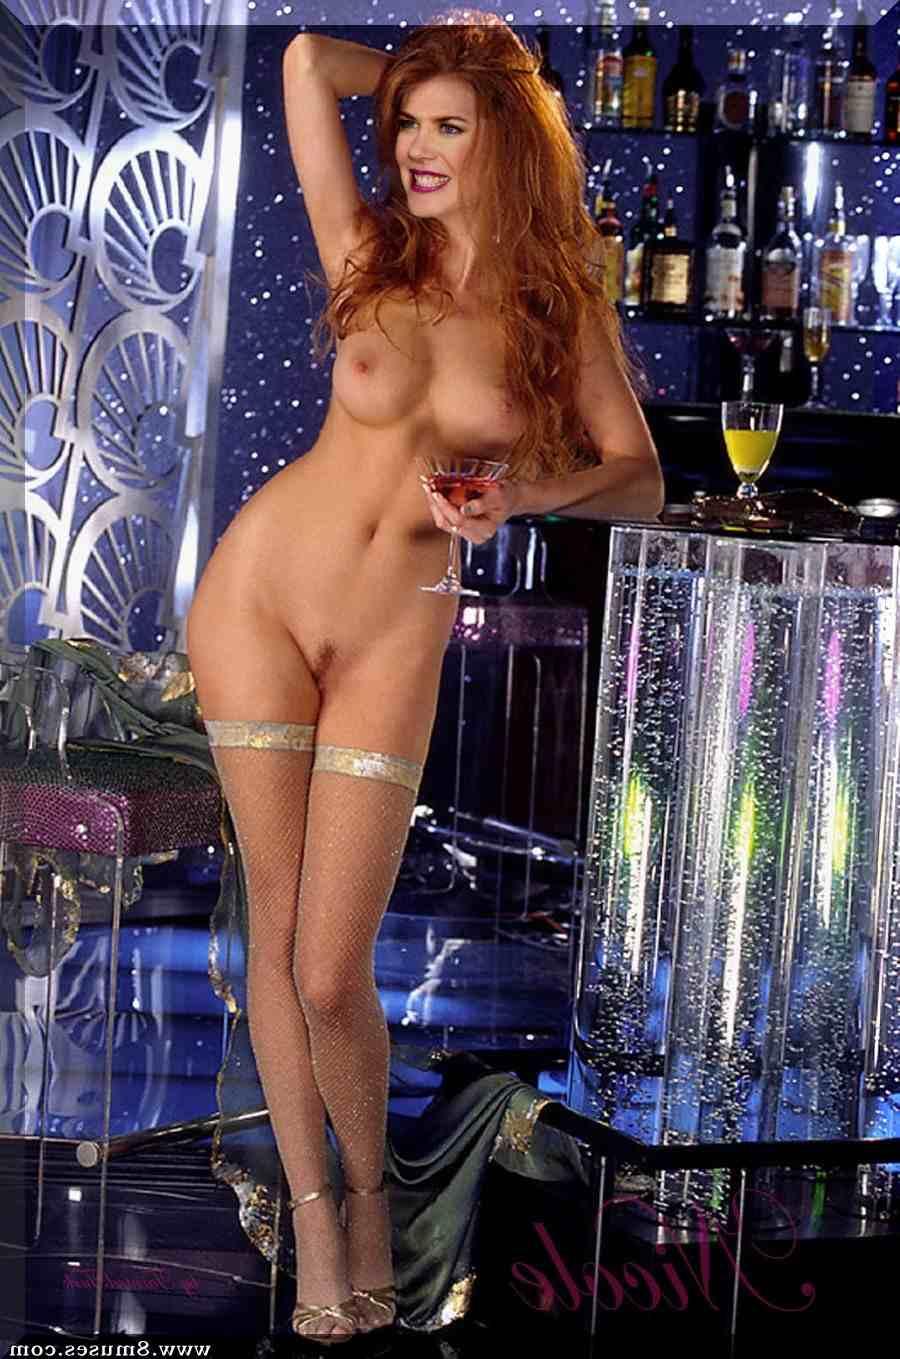 Fake-Celebrities-Sex-Pictures/Nicole-Kidman Nicole_Kidman__8muses_-_Sex_and_Porn_Comics_765.jpg